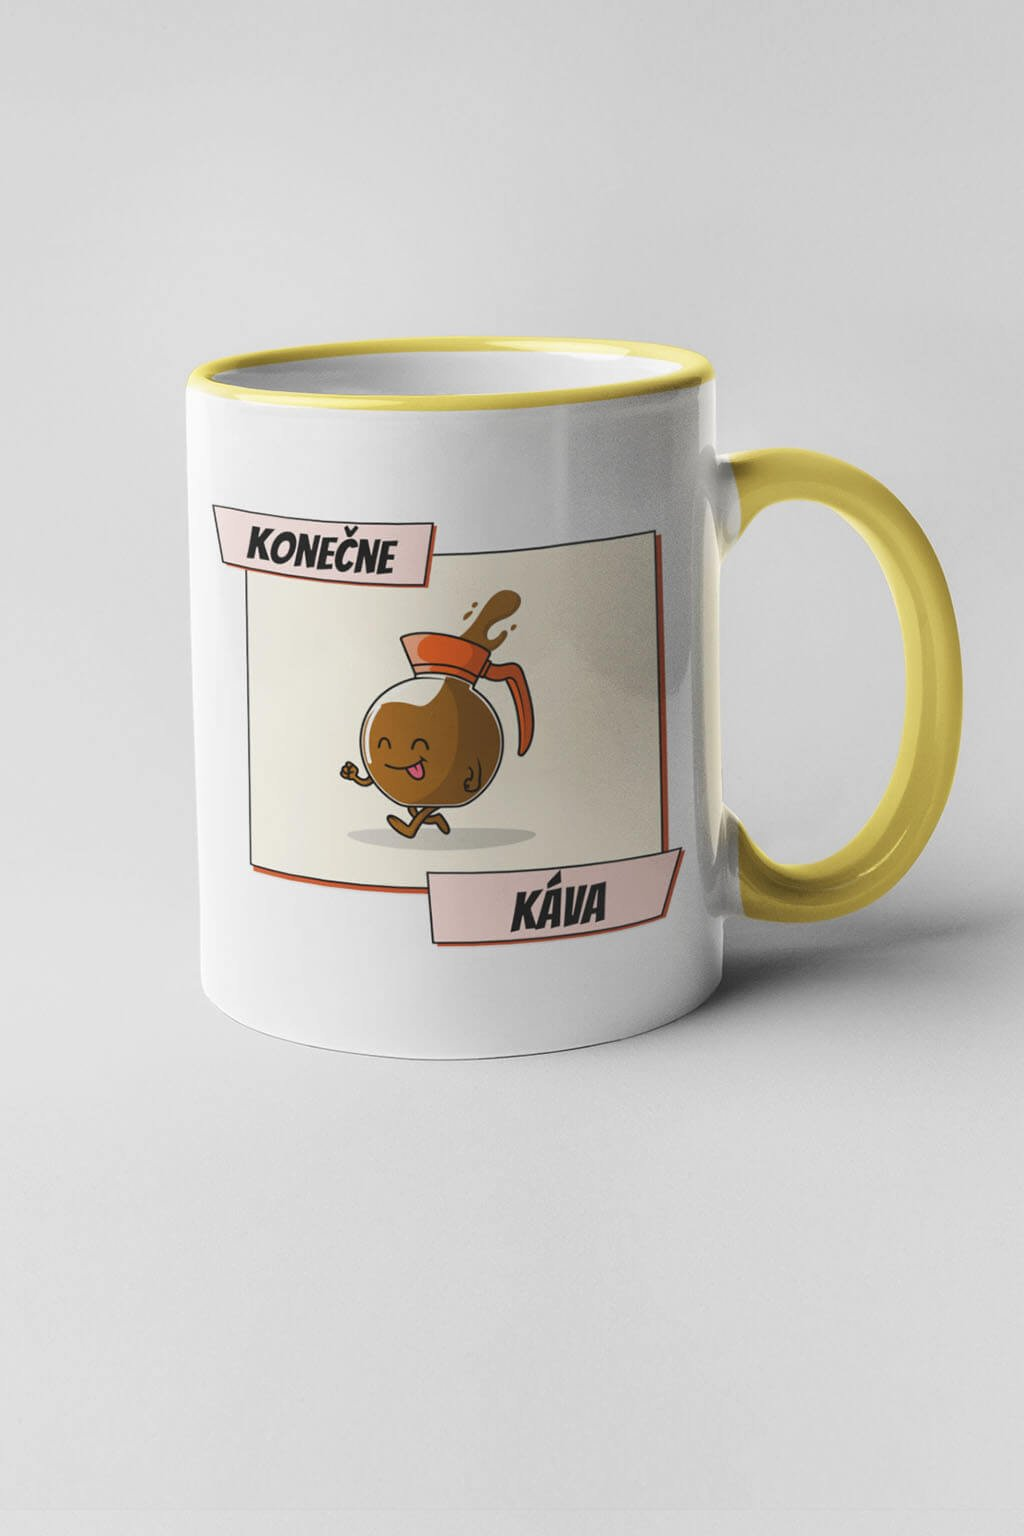 Šálka konečne káva